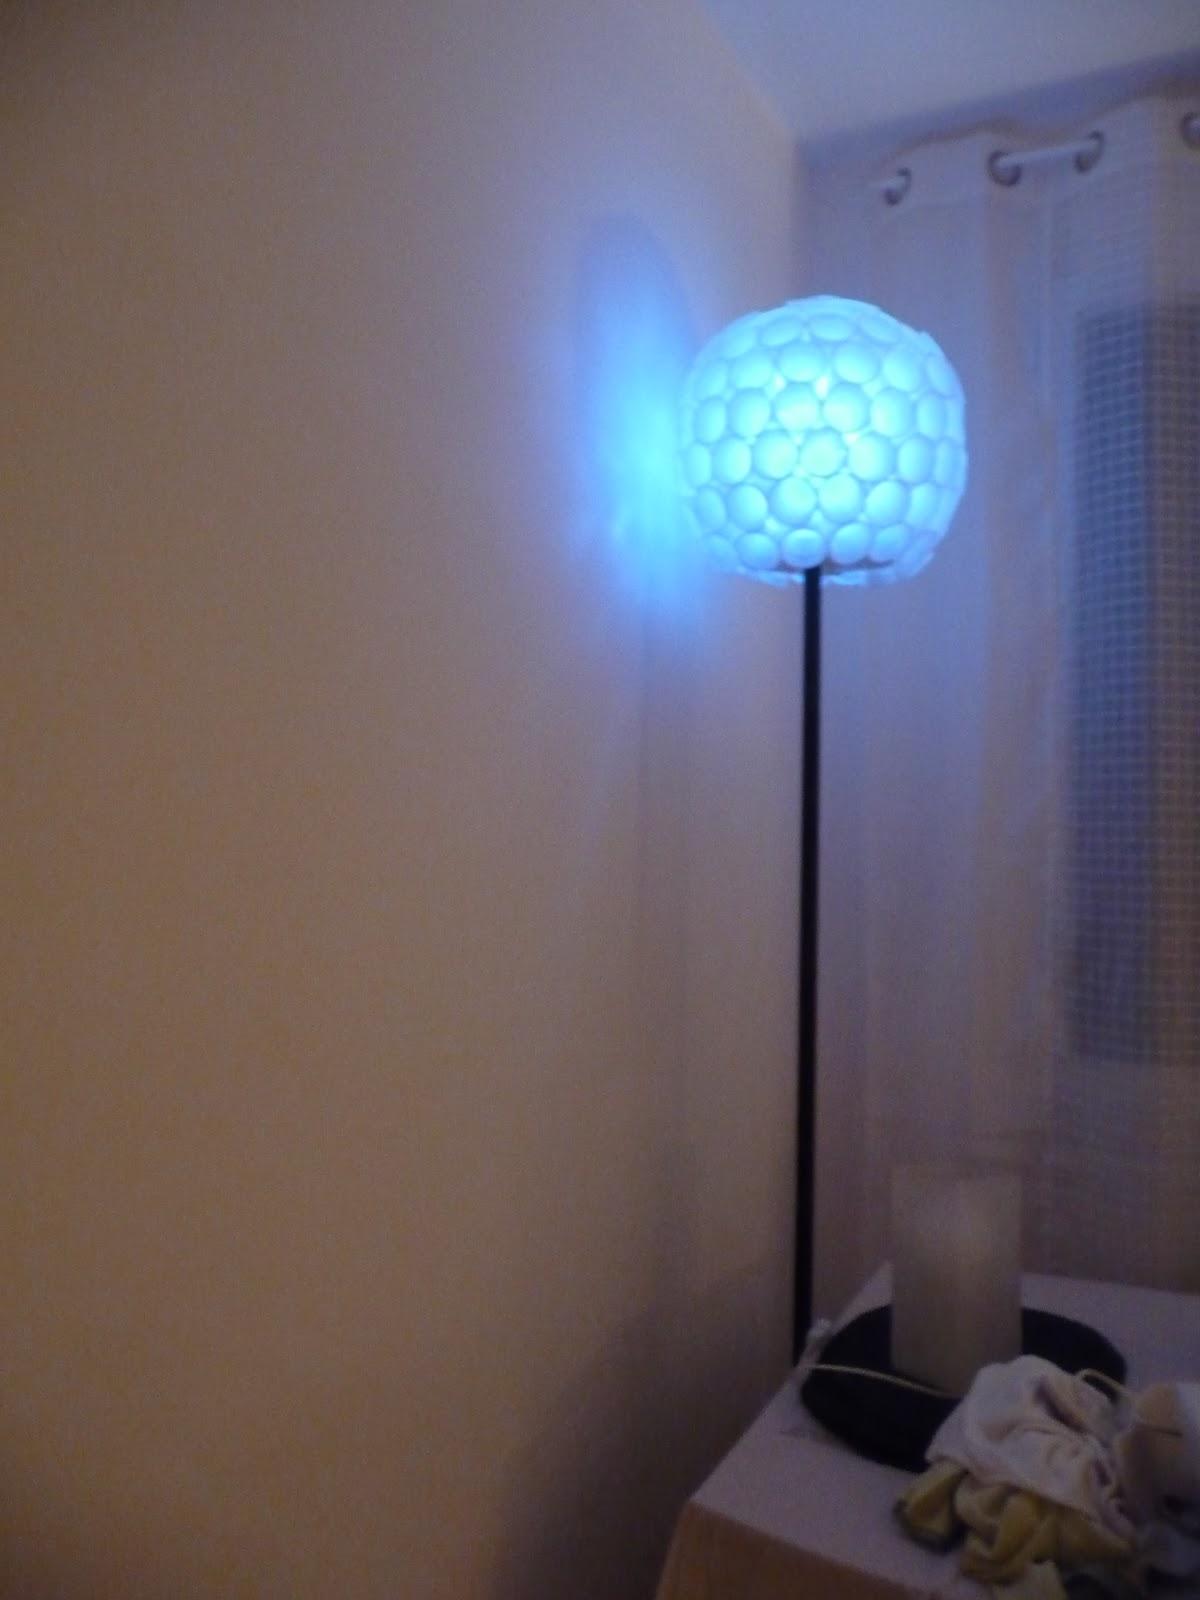 ma vie courante mon abat jour design en gobelet. Black Bedroom Furniture Sets. Home Design Ideas